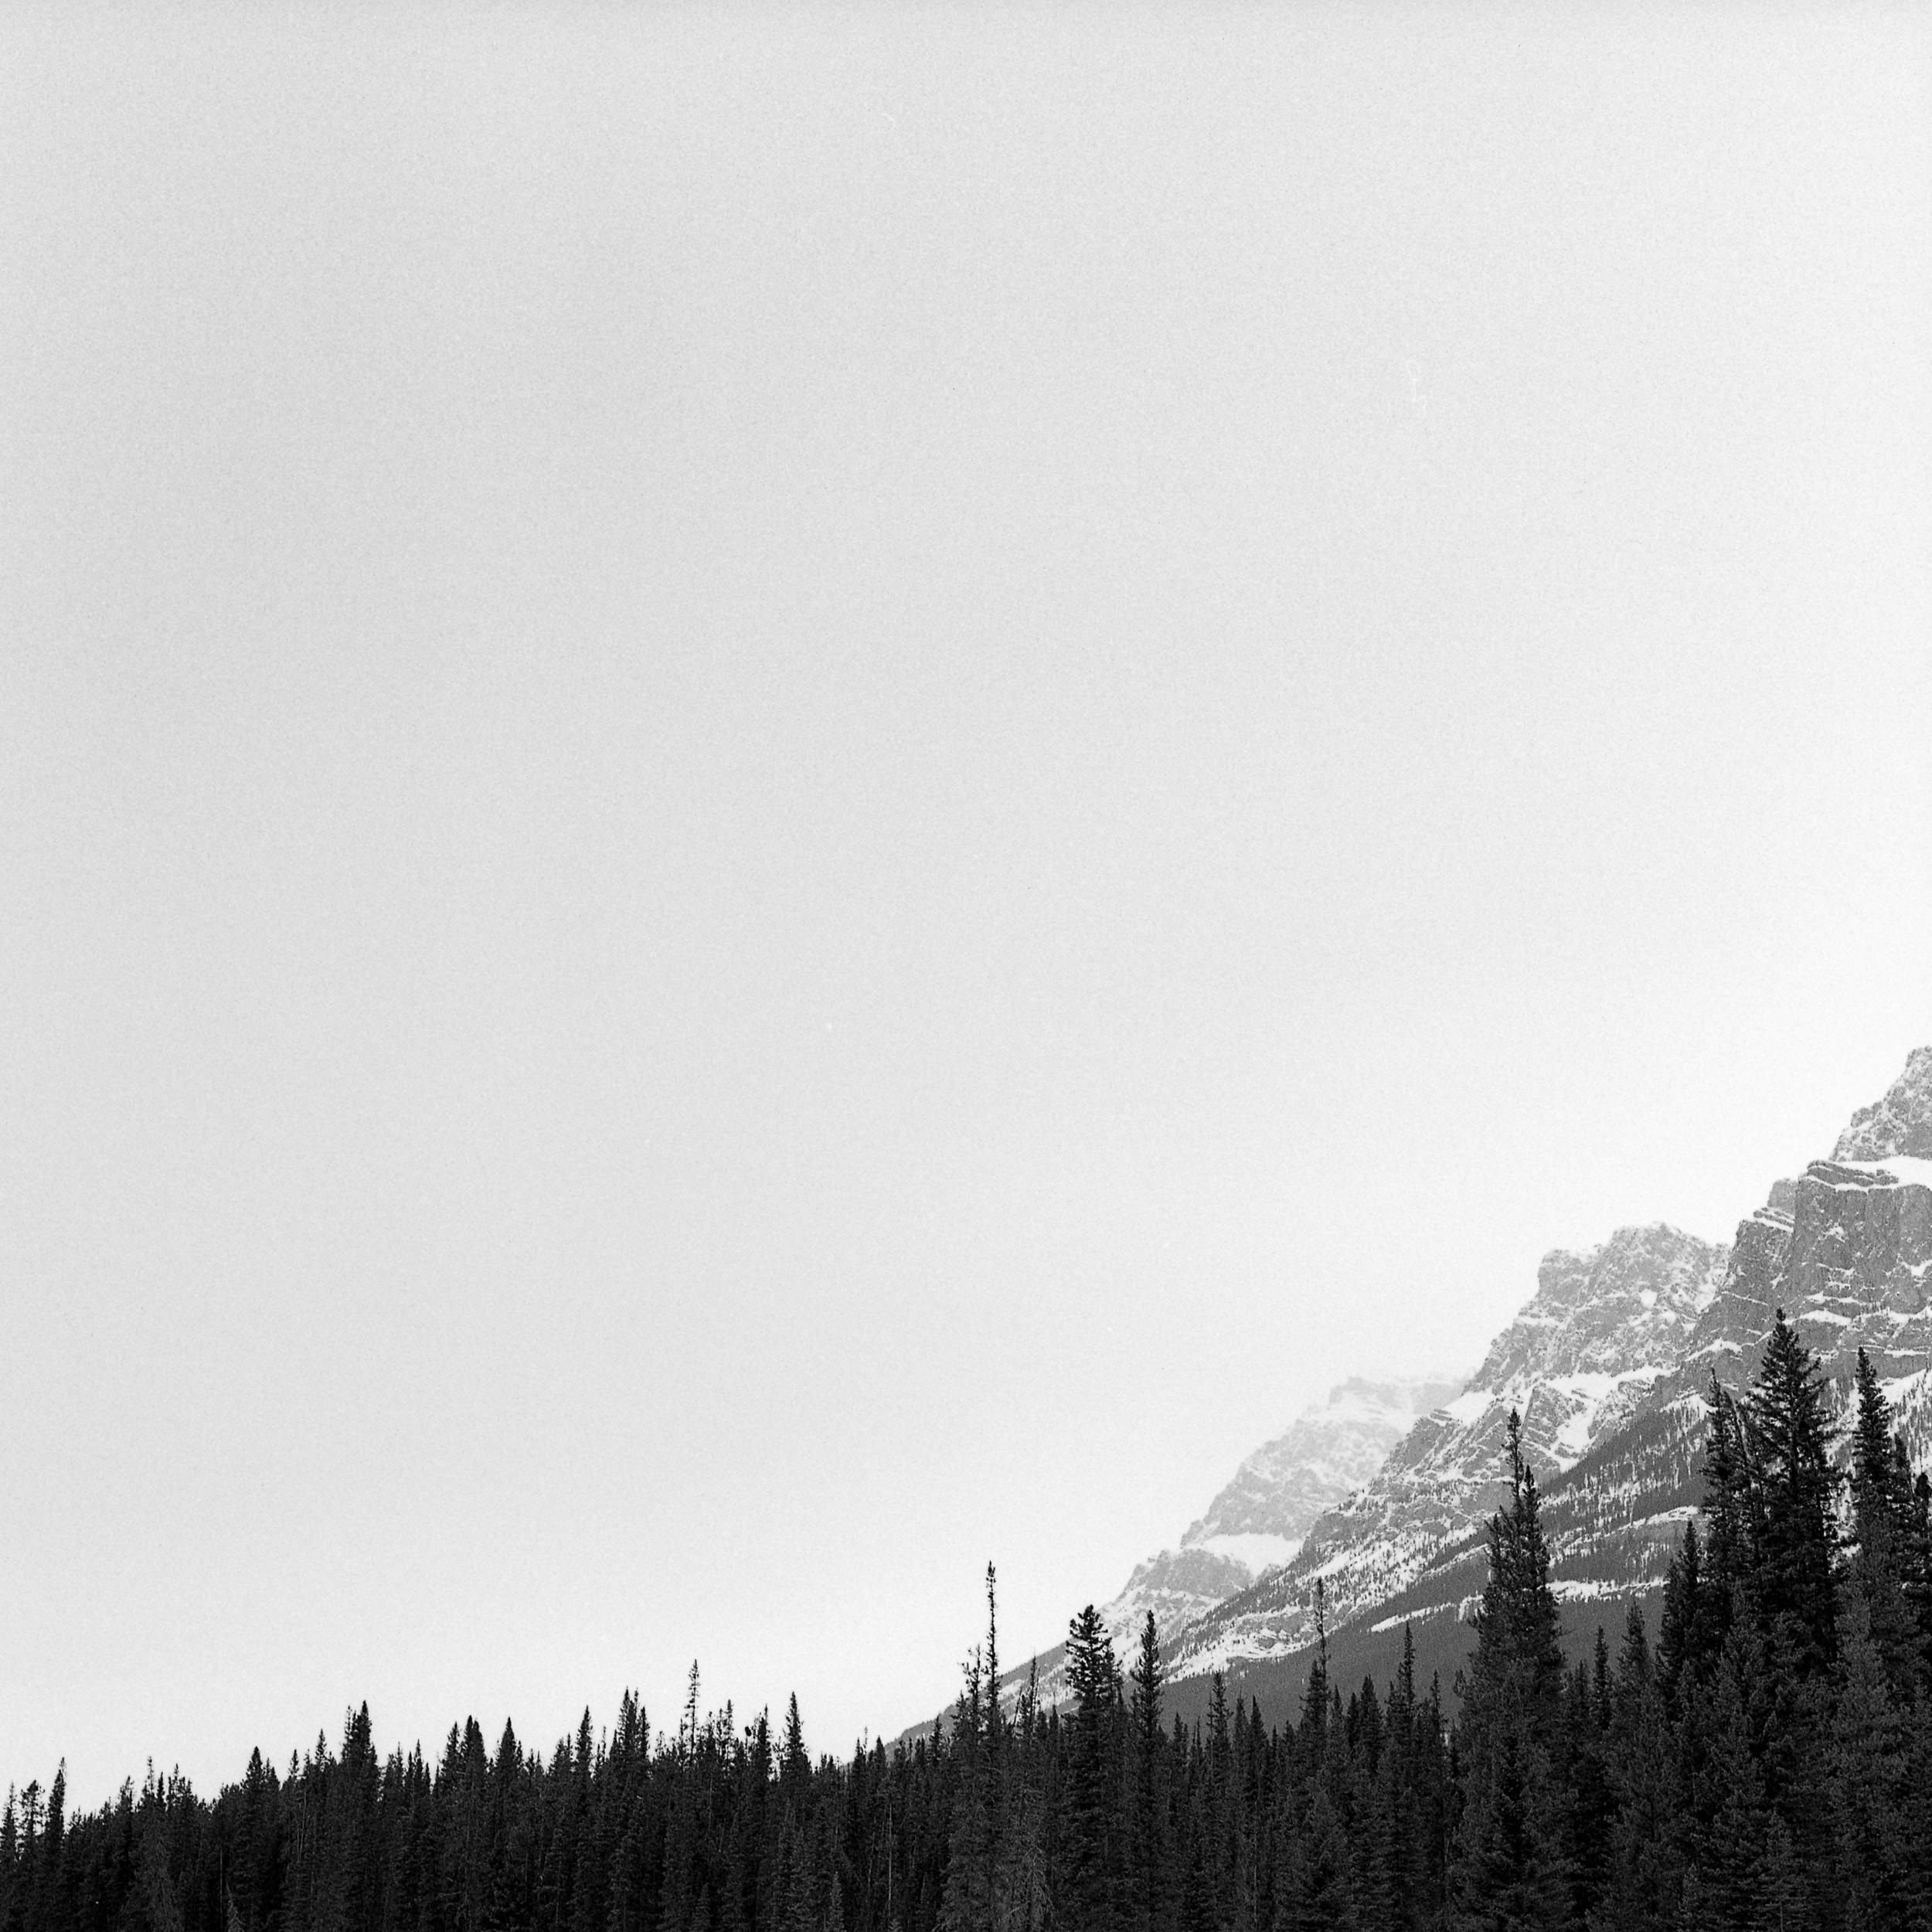 Banff_2018-5.jpg